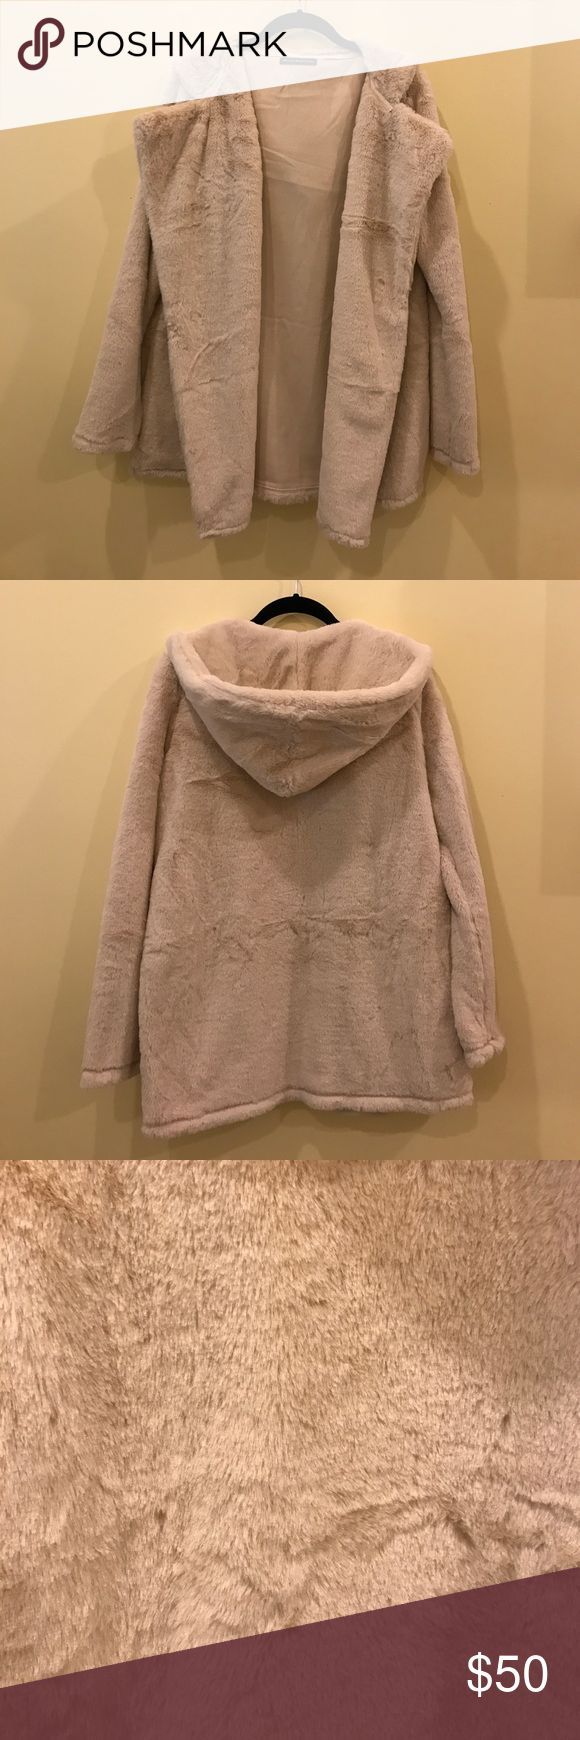 "Brandy Melville Faux Fur Hooded Coat No closure cream color faux fur hooded coat from Brandy Melville. *Never worn. *No size tag. *Approximate measurements: shoulder to shoulder: 17"", length: 28"", sleeve length: 25"". Brandy Melville Jackets & Coats"